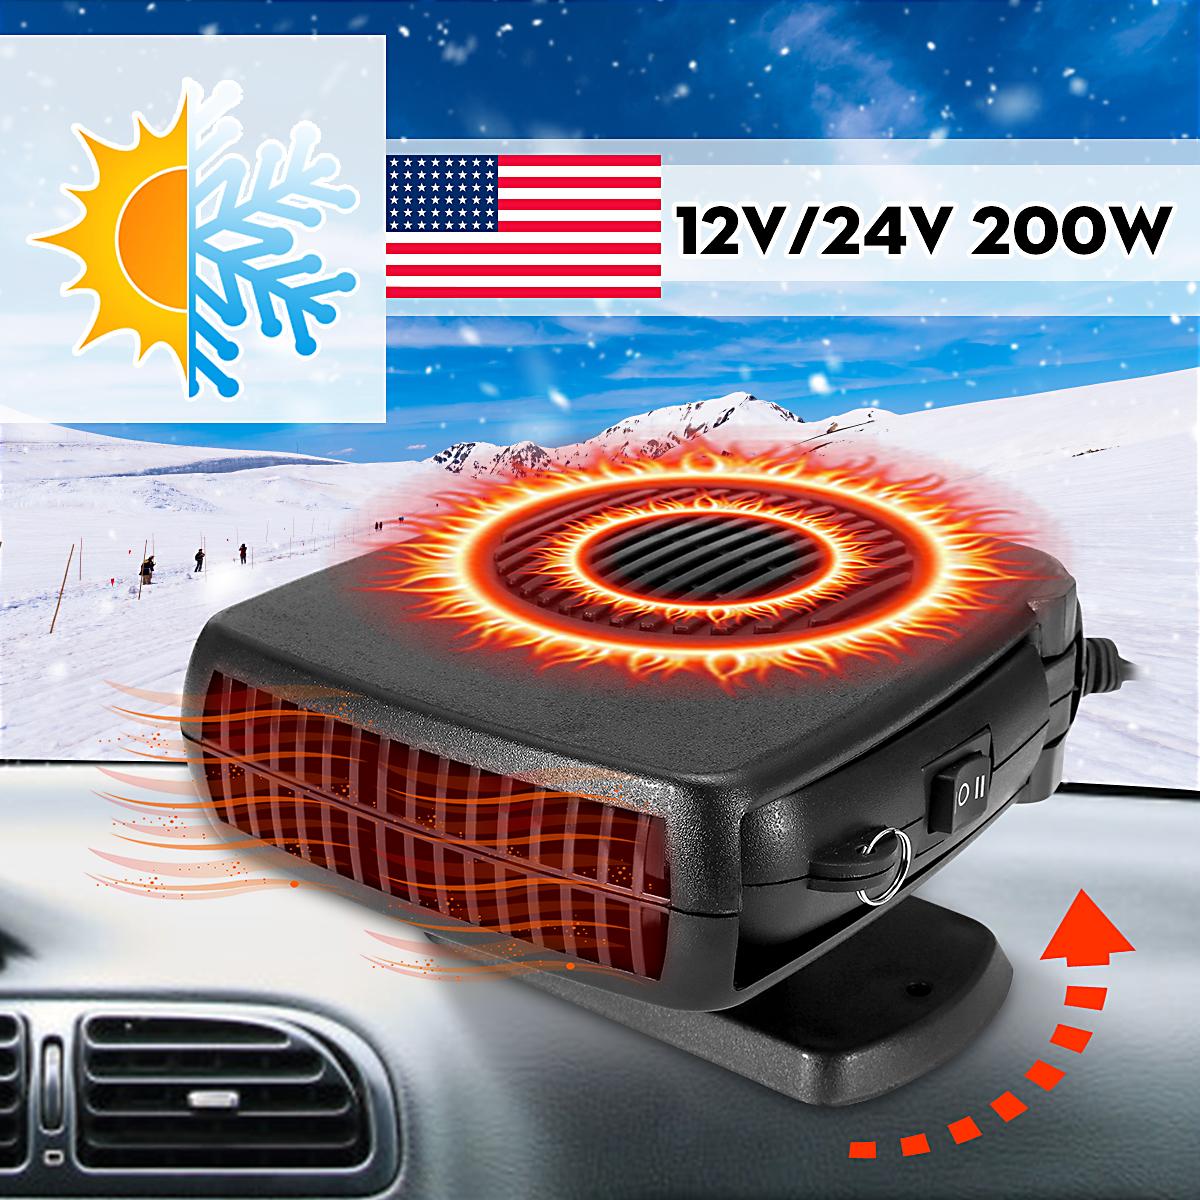 12V /24V 150-200W Portable Car Fast Heating Cooling Fan Windscreen Demister Cold Wind/Hot Wind For Car Vehicle